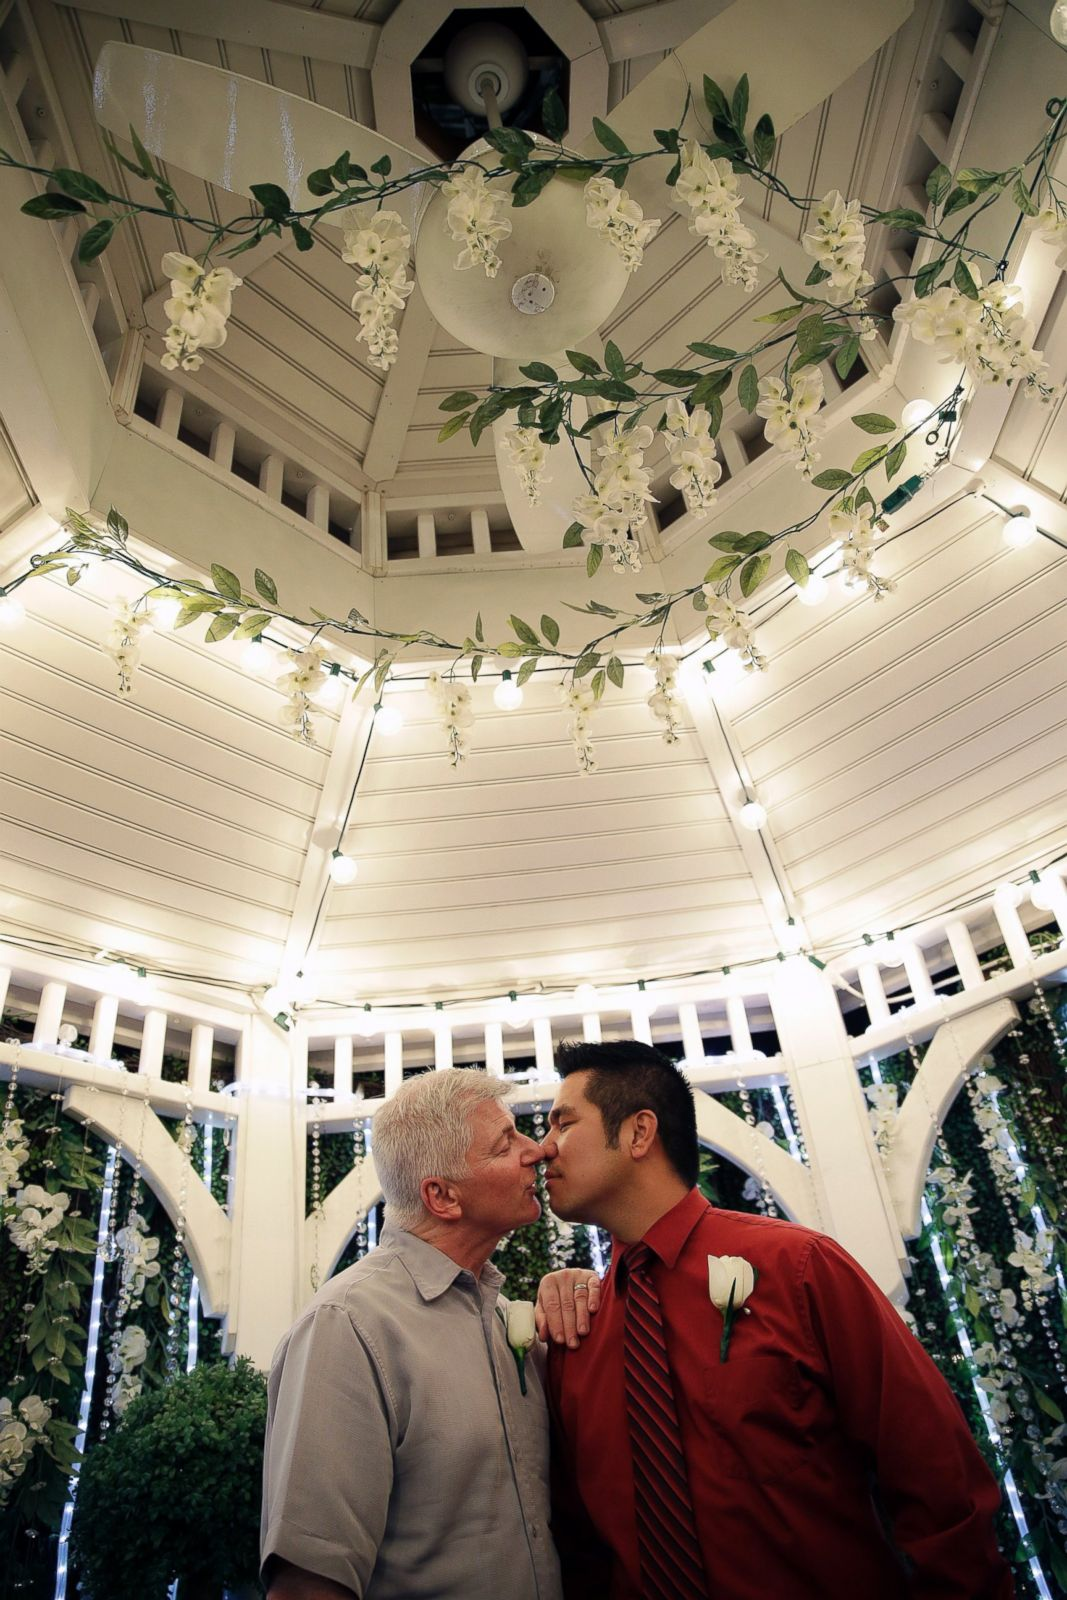 Ap gay marriage las vegas 7 sk 141010 2x3 1600jpg for Gay wedding las vegas